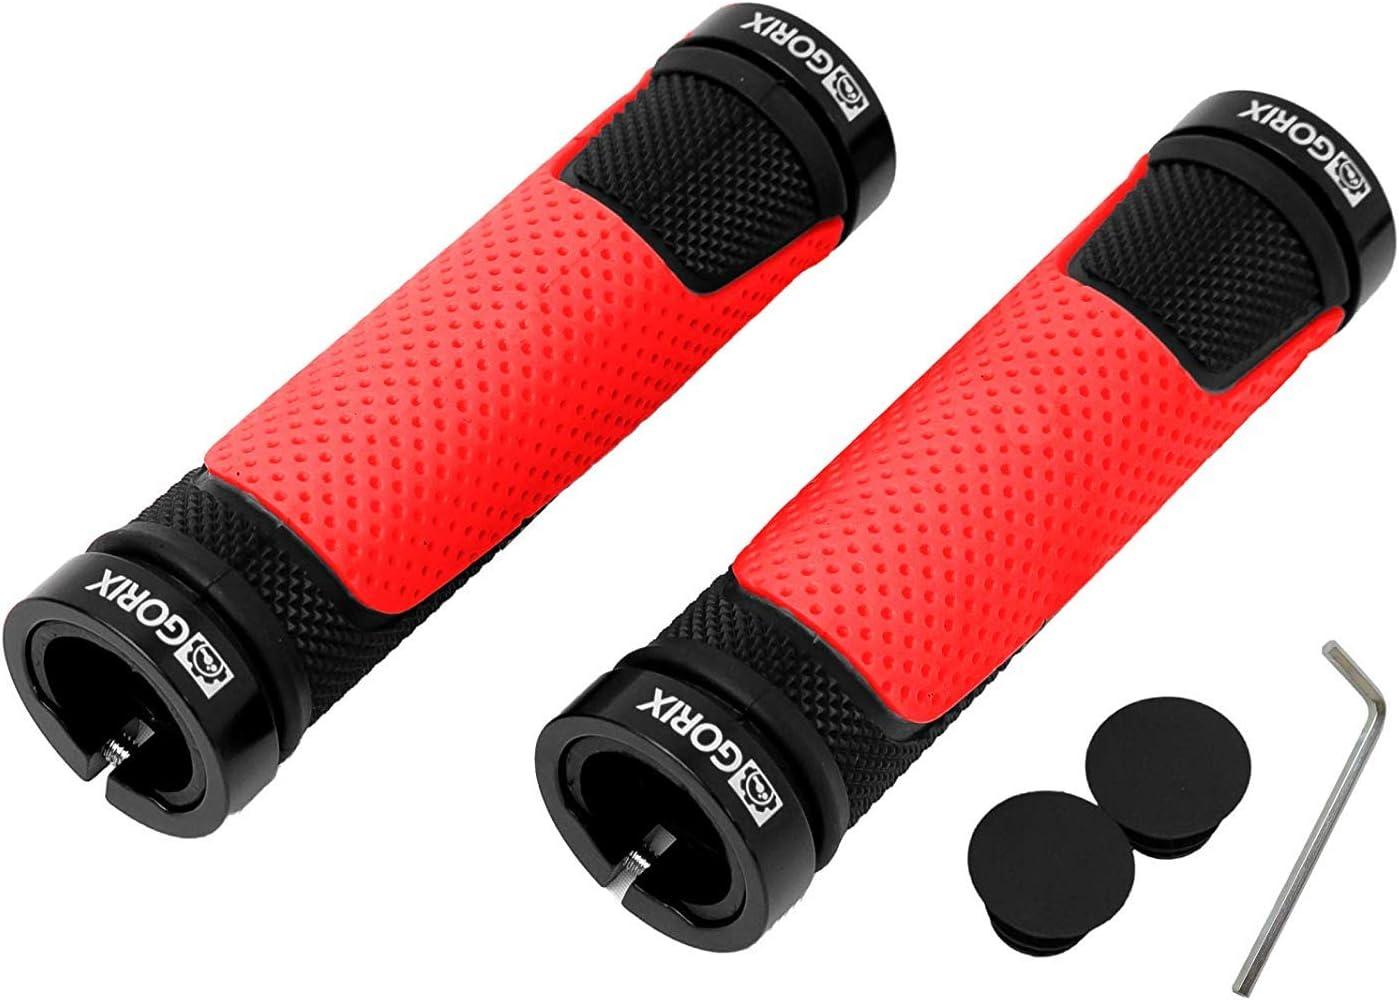 GORIX Bike Grips Bar End Cycle Lock On Soft Flat Handlebar MTB Bicycle GX-776AD3-L2-G2